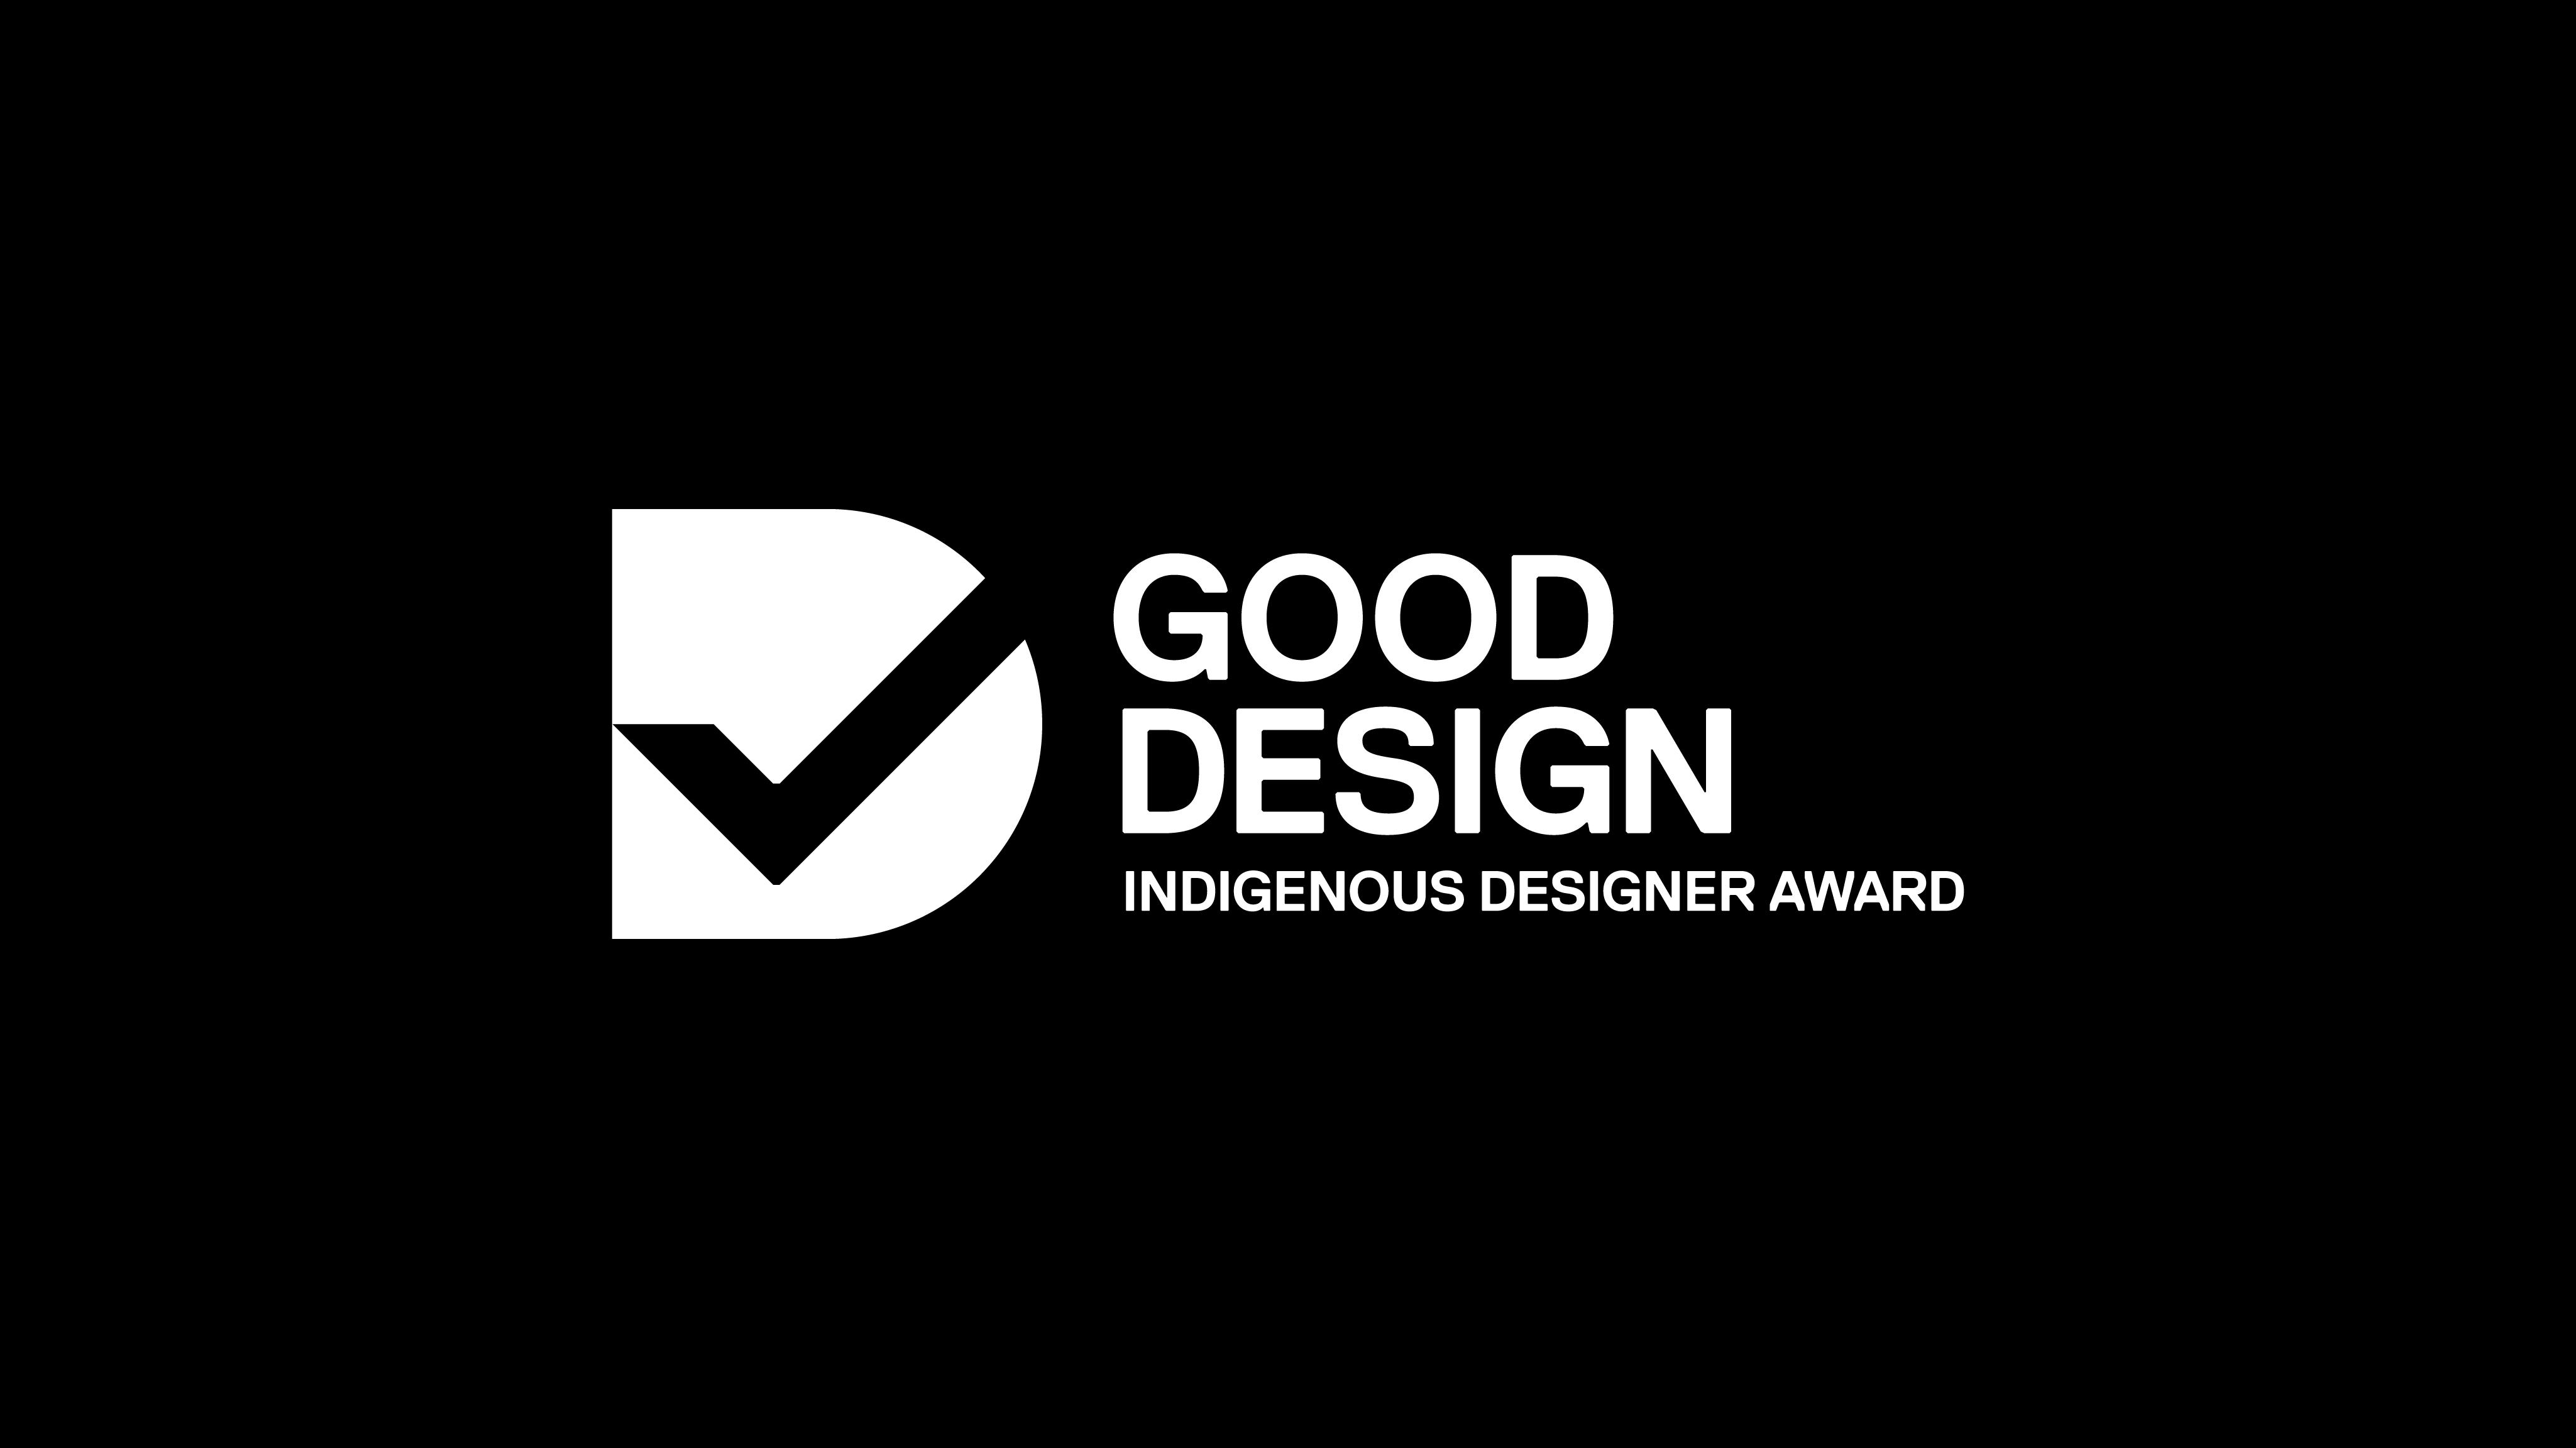 Indigenous Designer Award